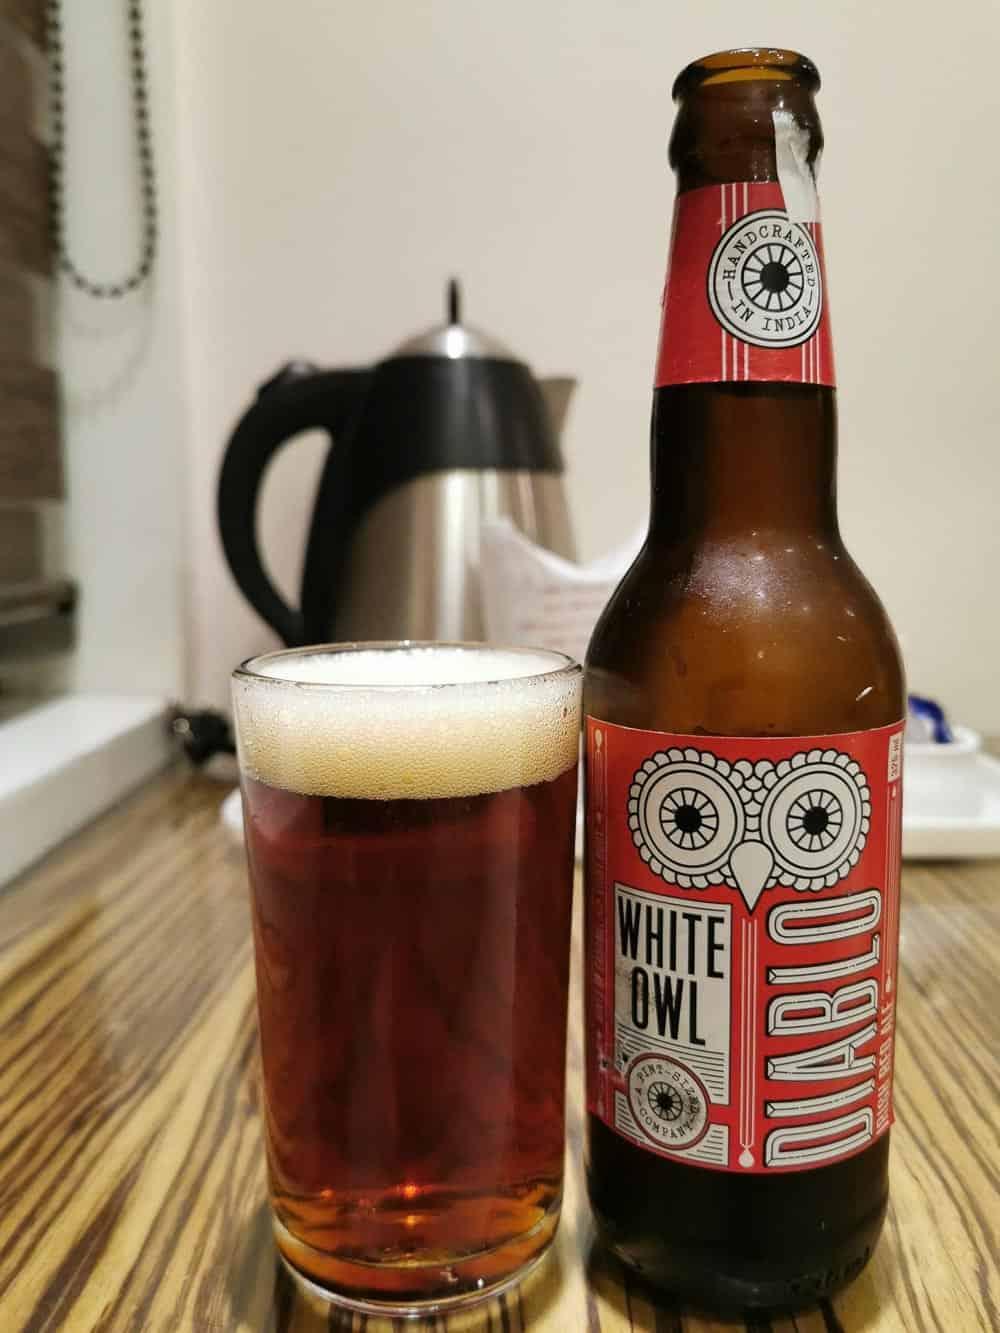 The White Owl Diablo india craft beer